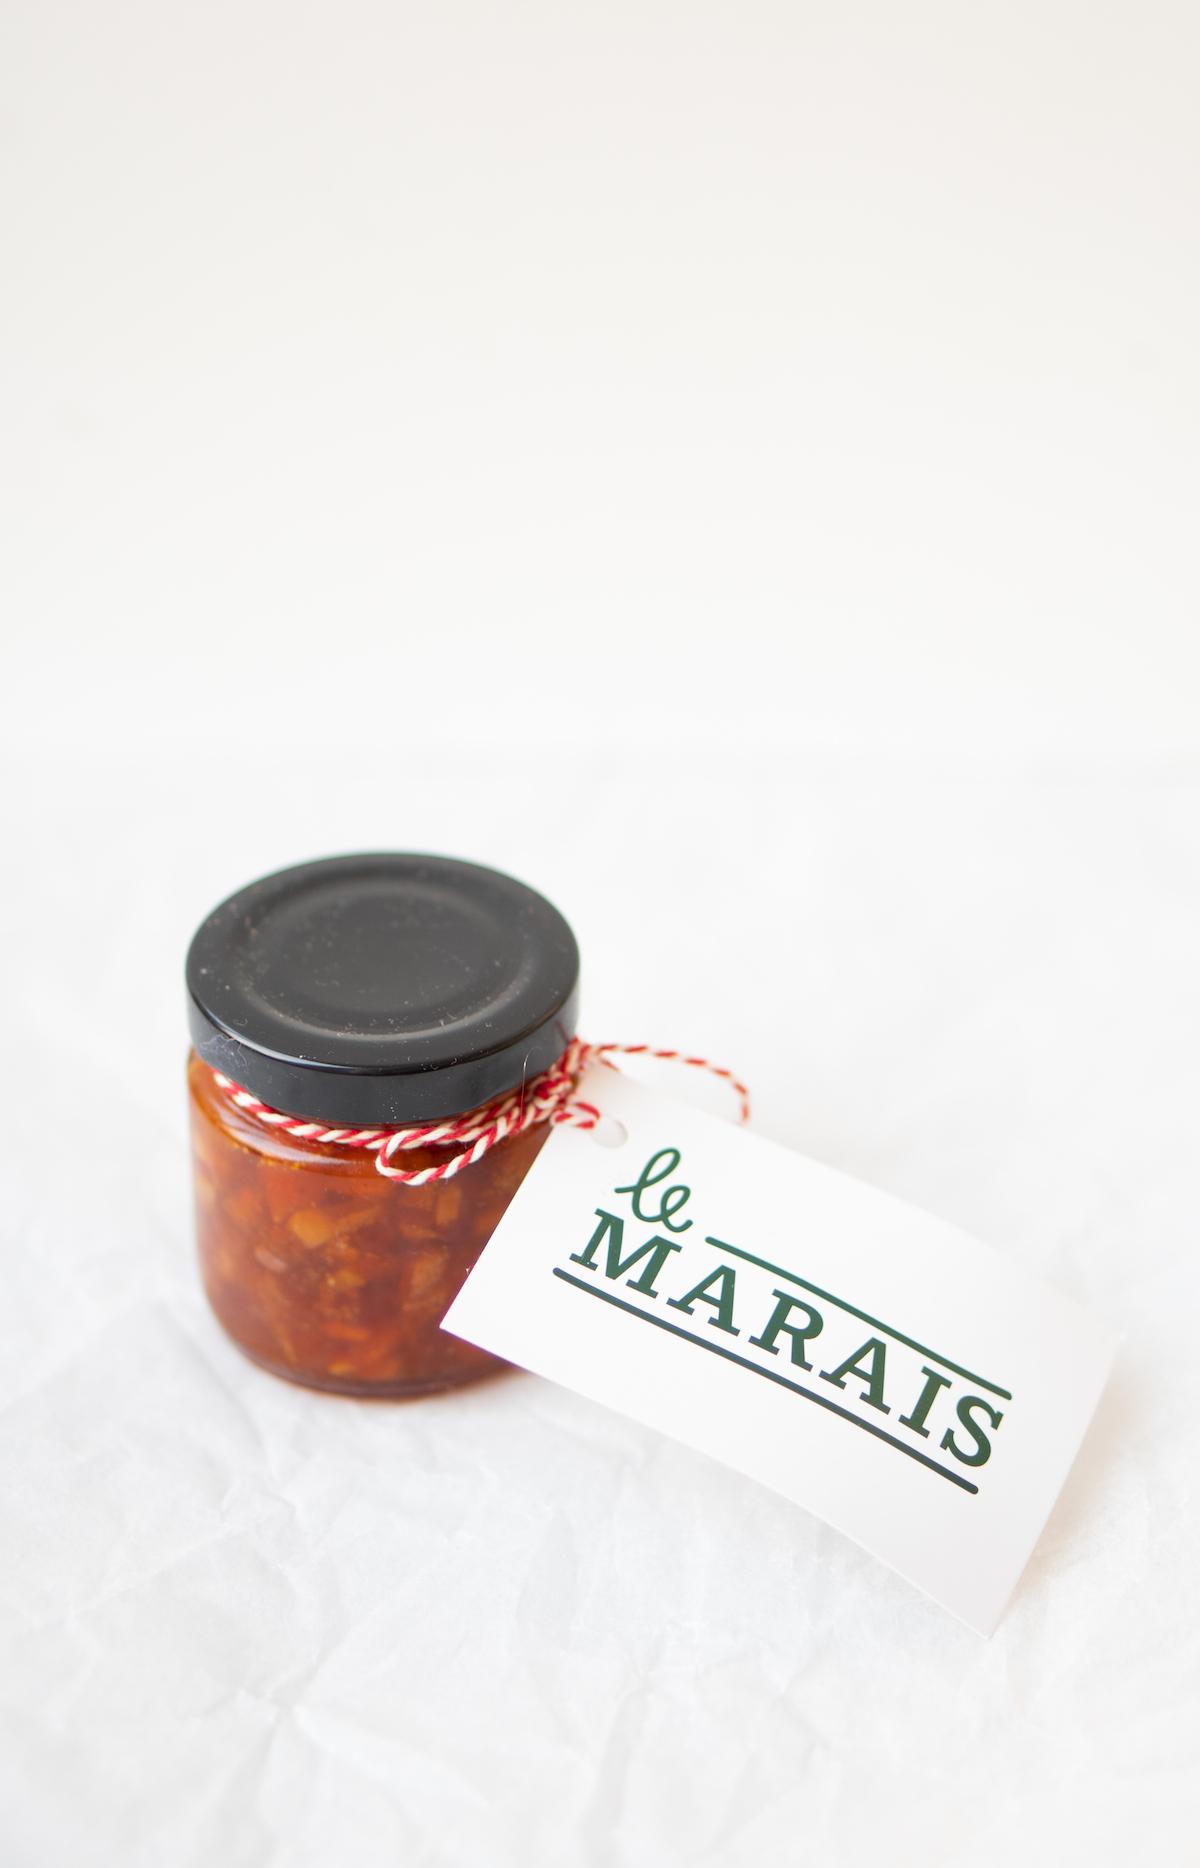 Marmelade bloedsinaasappel